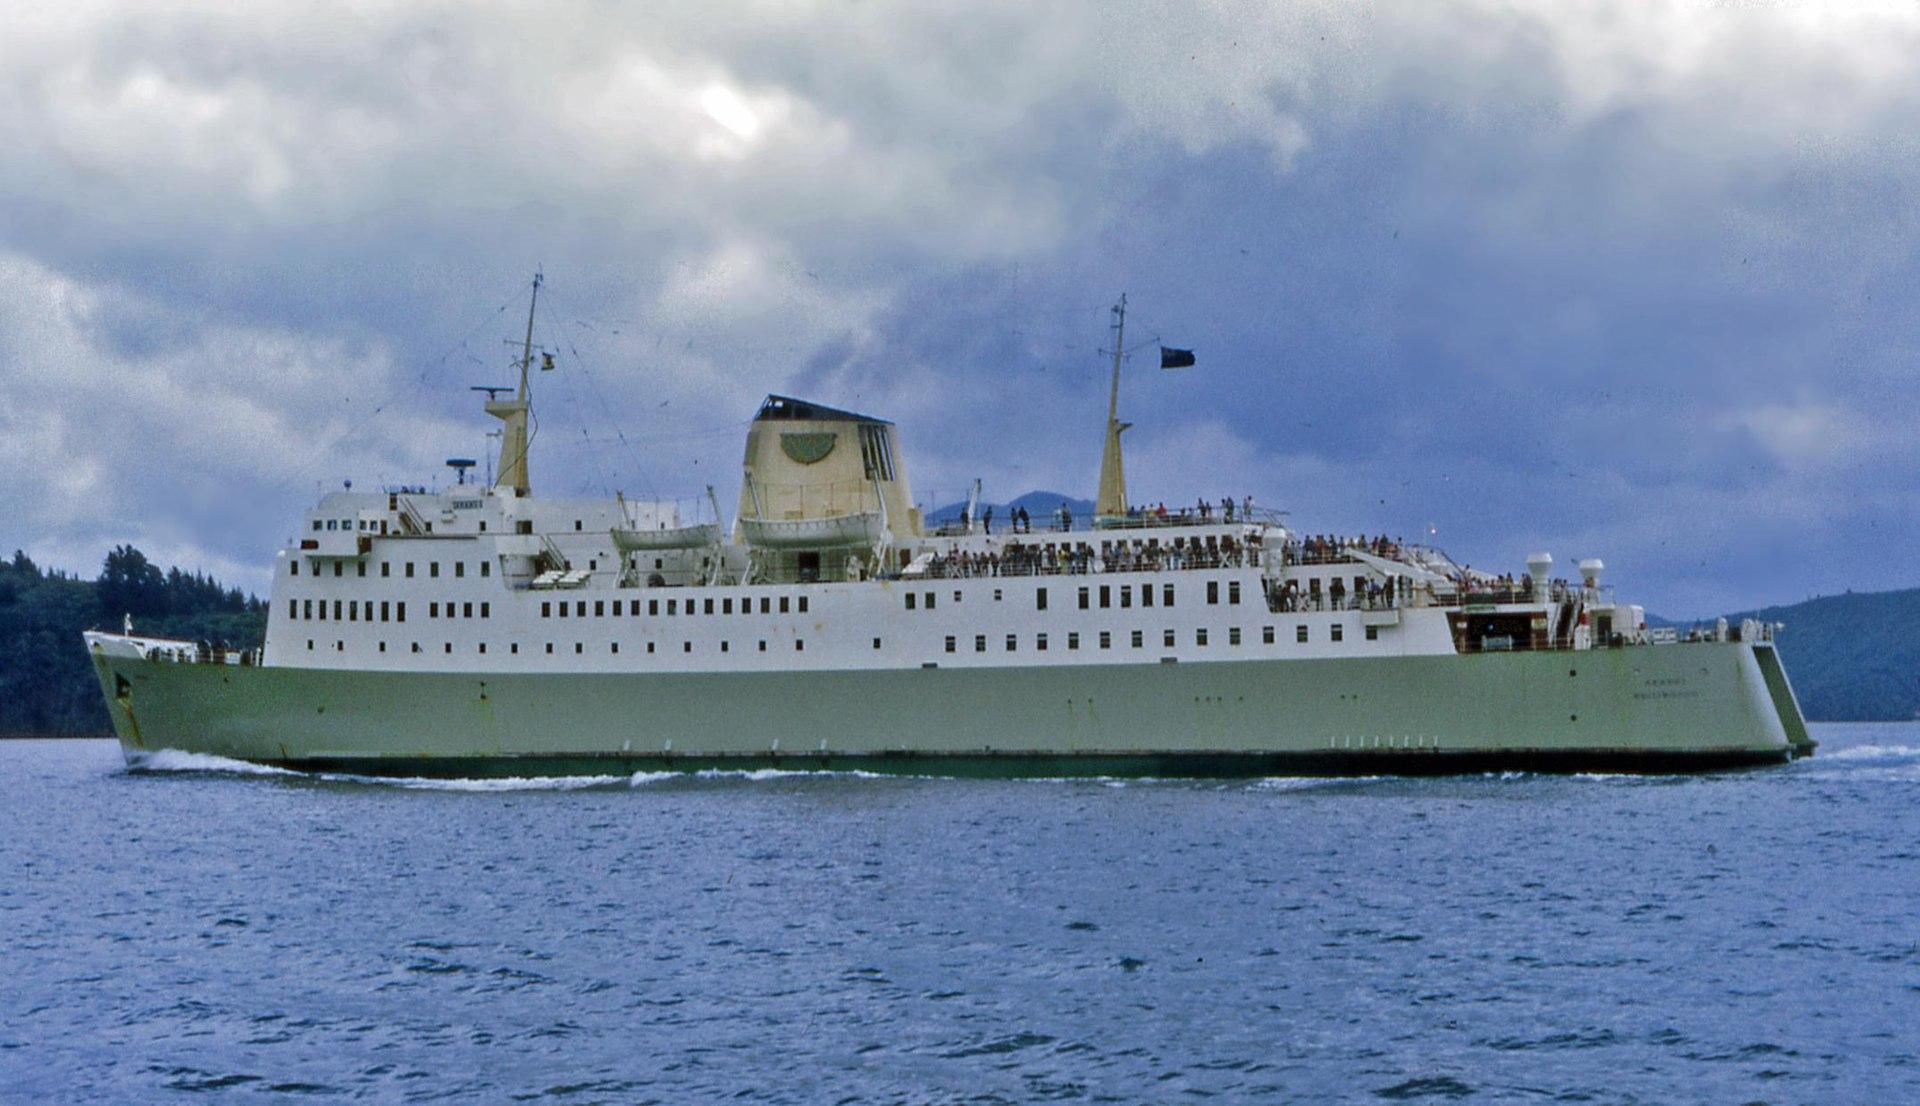 Inter Island Shipping Job